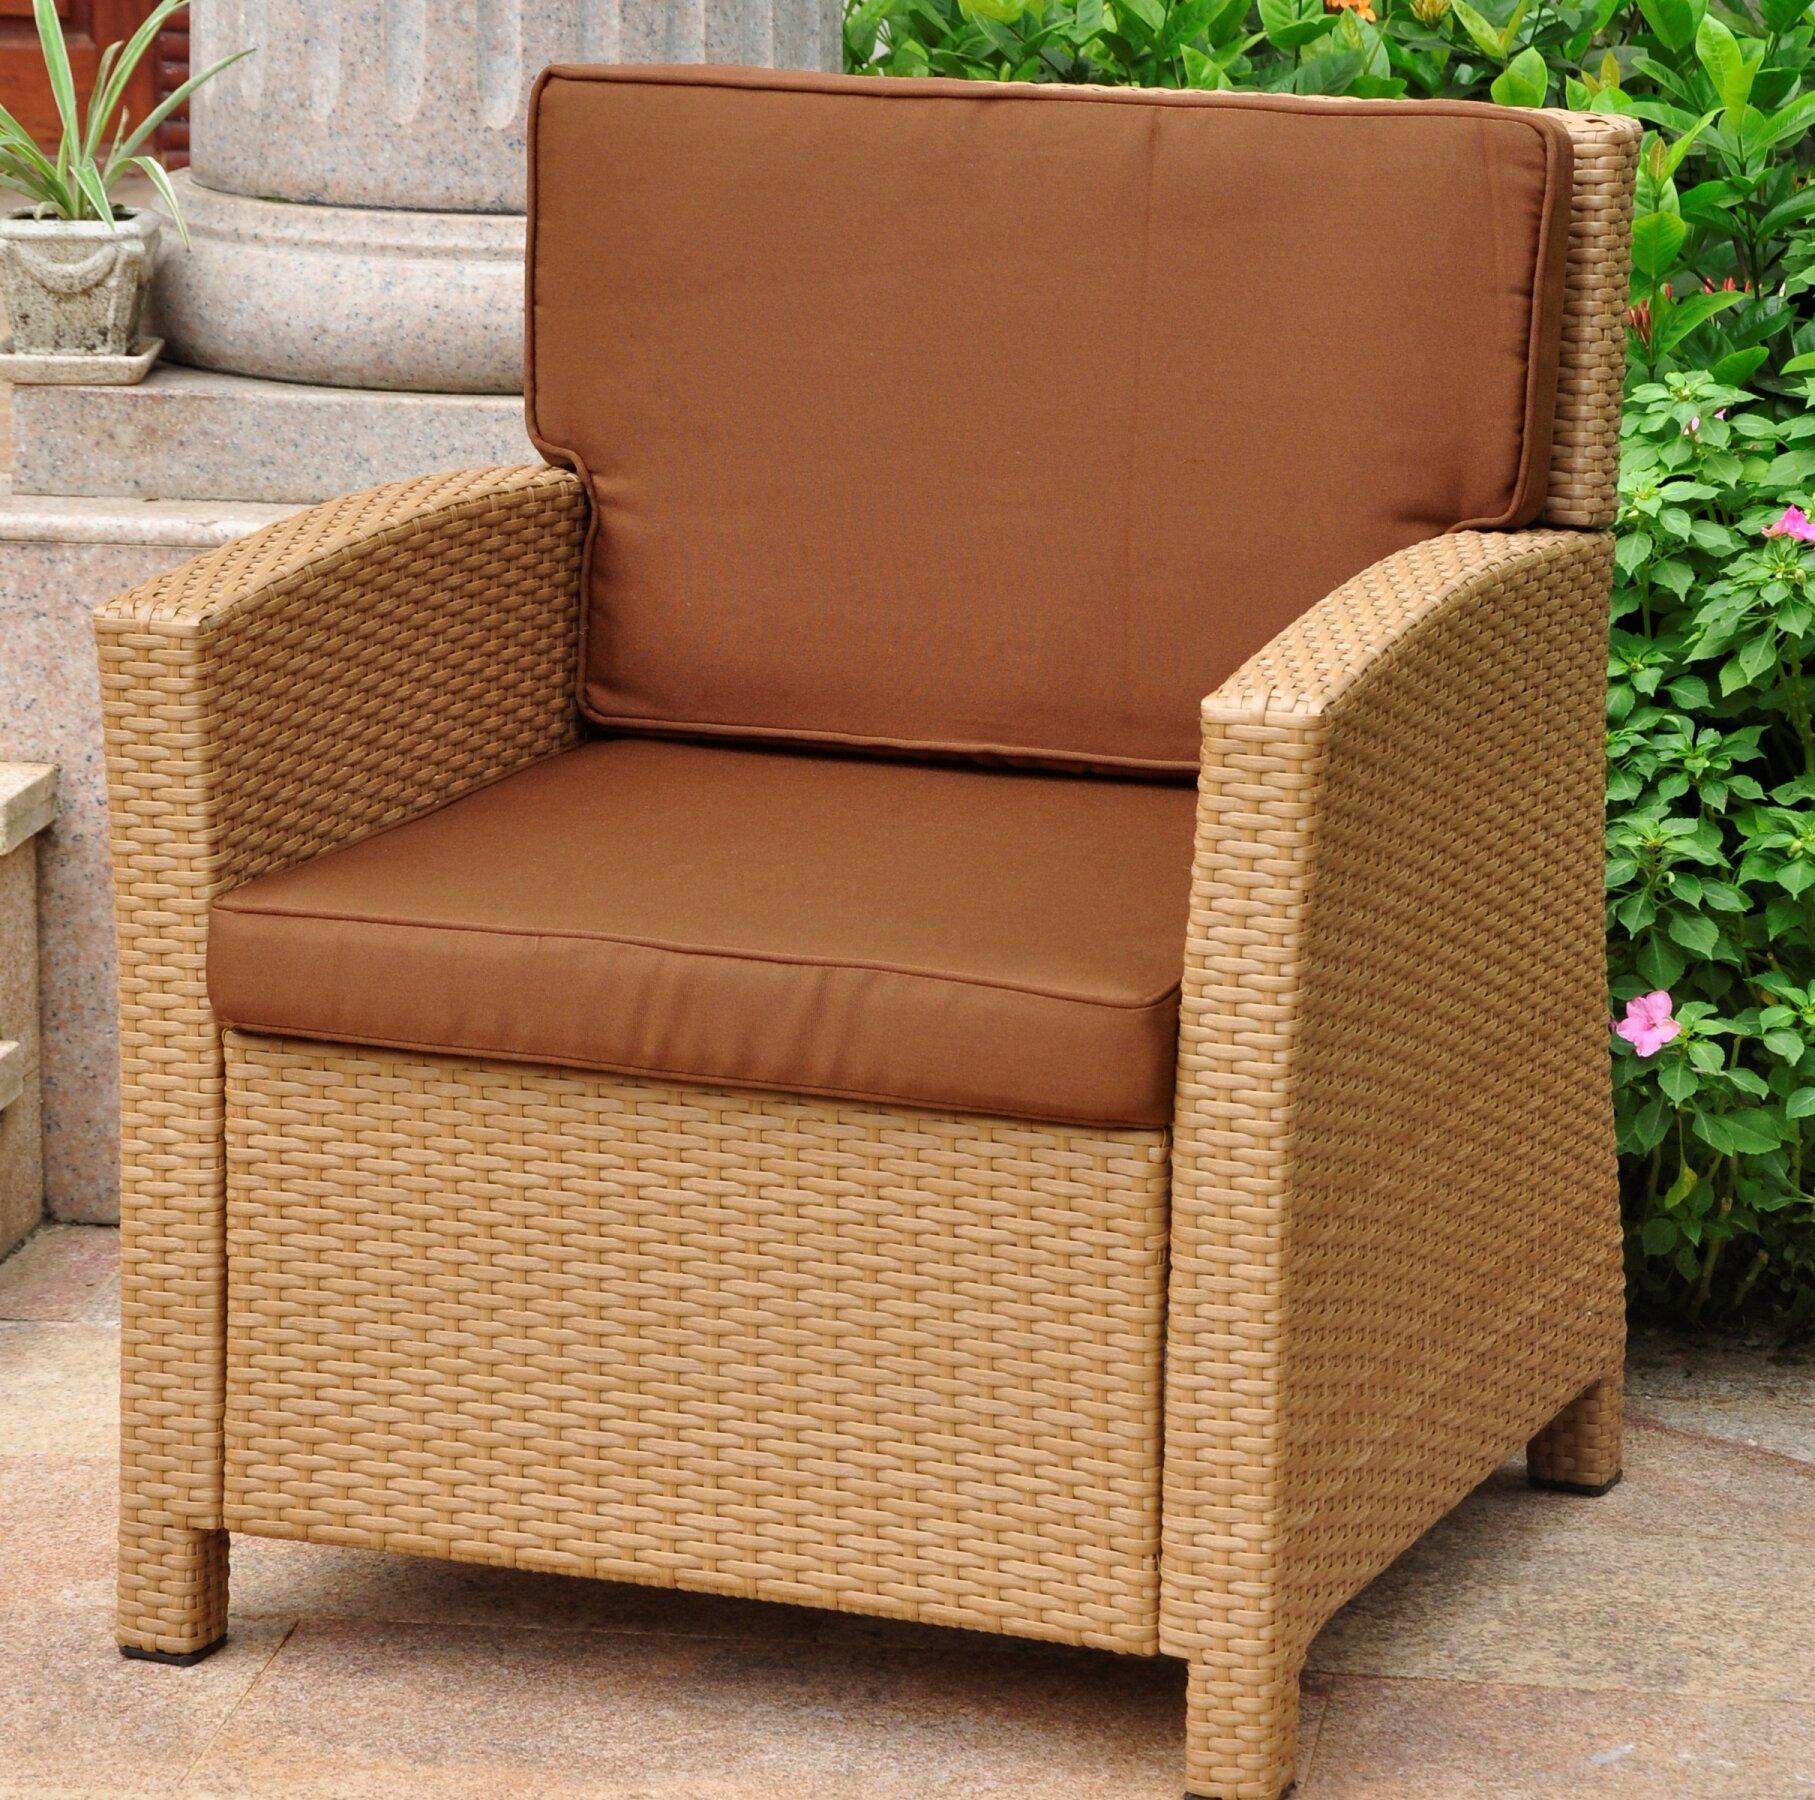 Charlton Home Stapleton Wicker Resin Contemporary Patio Chair With Cushion Reviews Wayfair